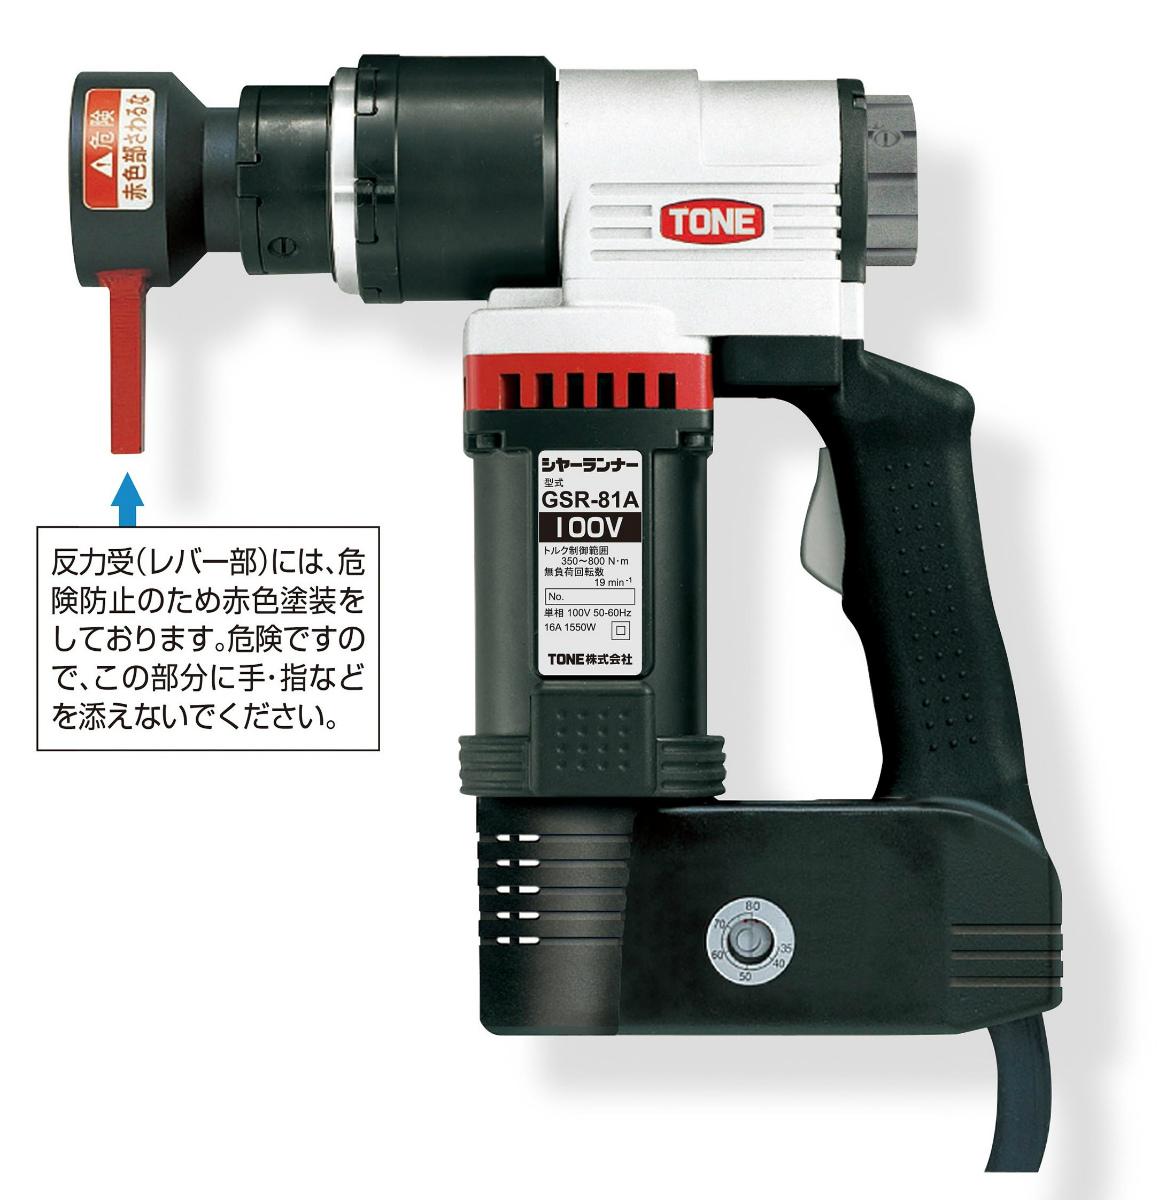 TONE (トネ) シャーランナー【ナットランナー】 GSR82A